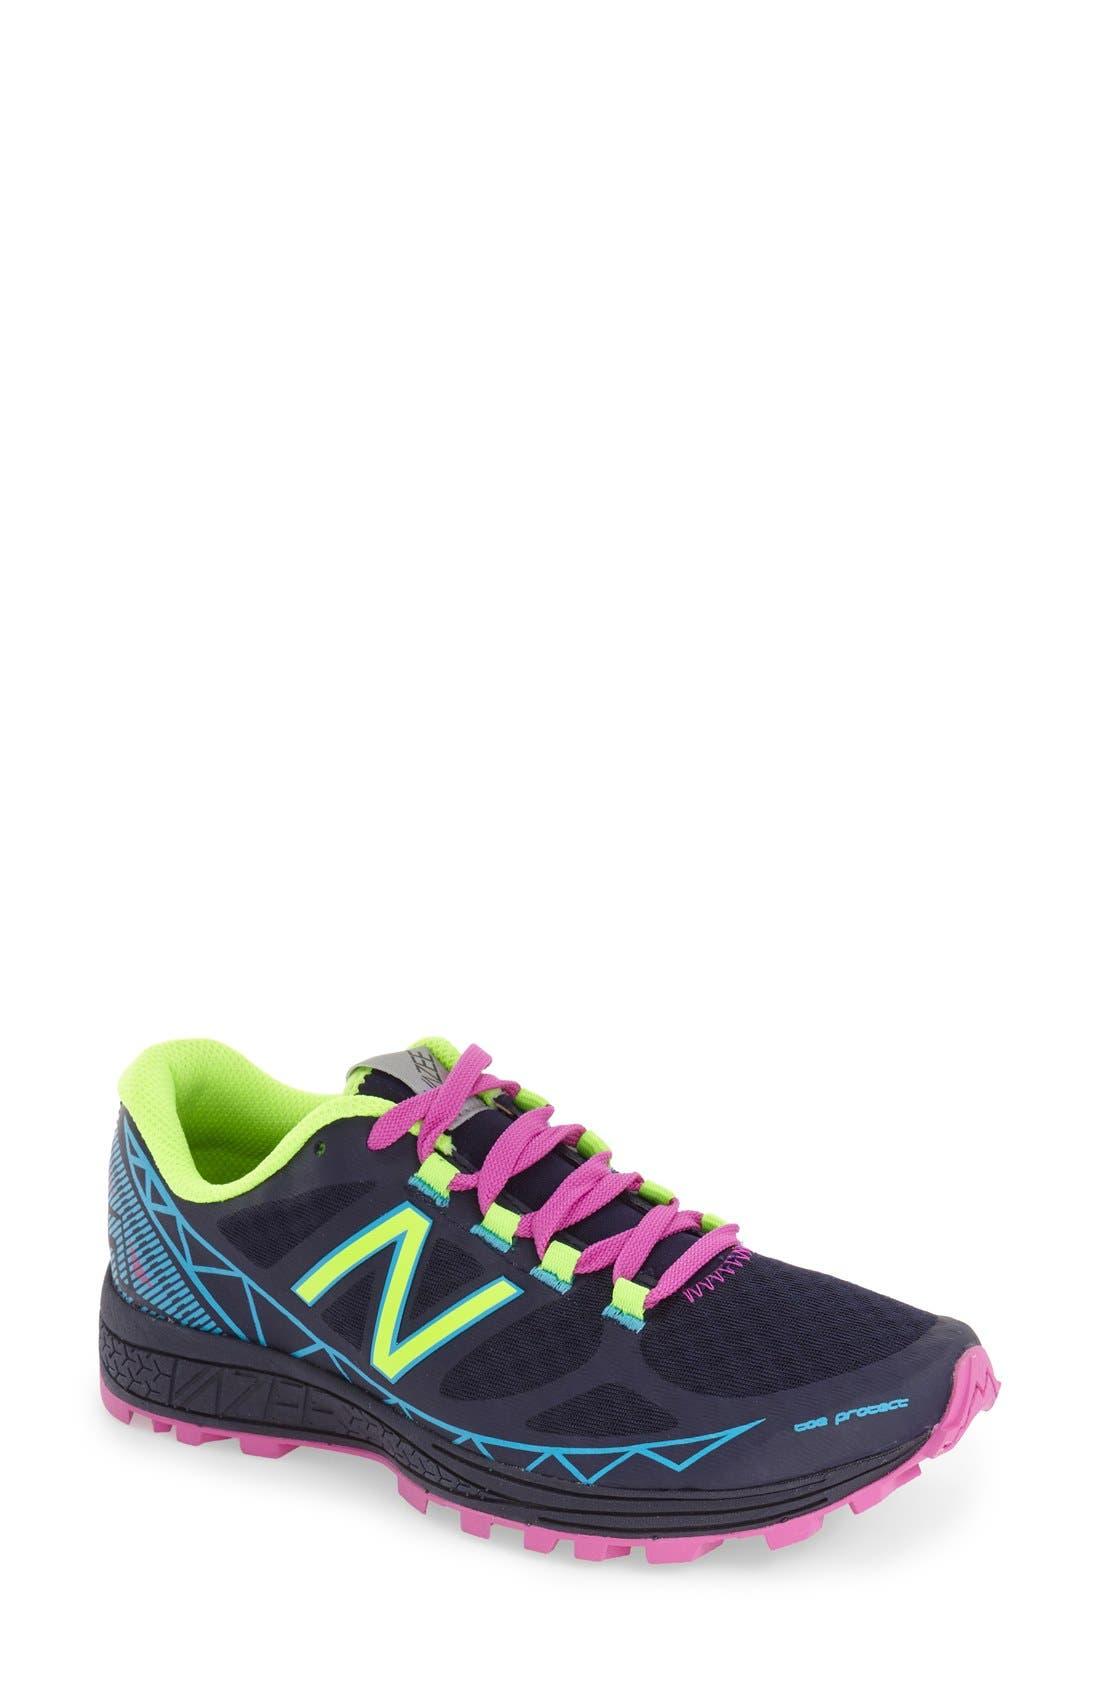 Alternate Image 1 Selected - New Balance 'Vazee Summit' Trail Running Shoe (Women)